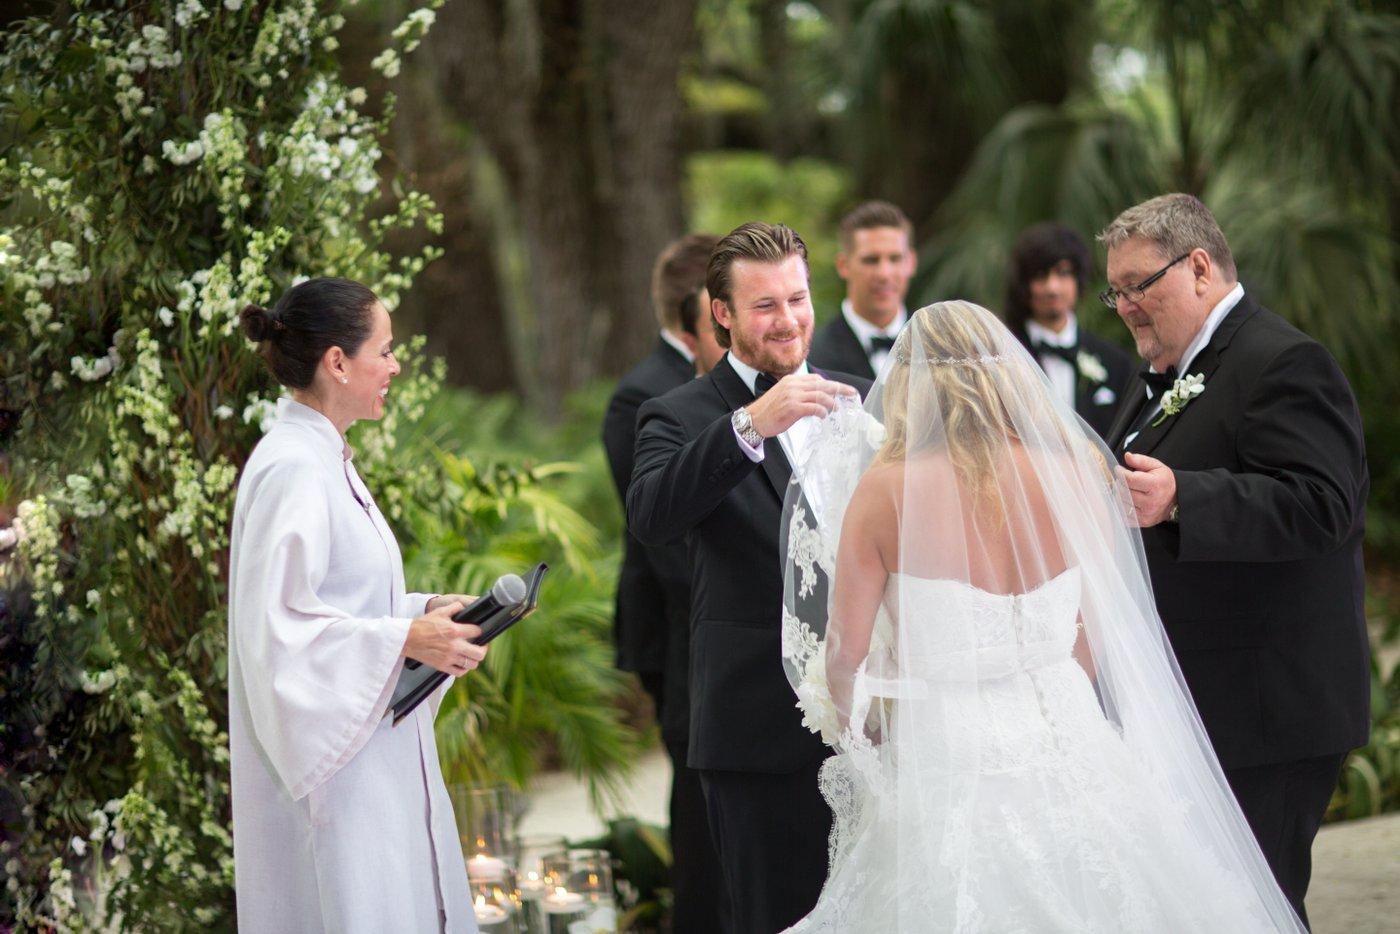 vizcaya ceremony photos miami, best wedding photographer miami, haring photography